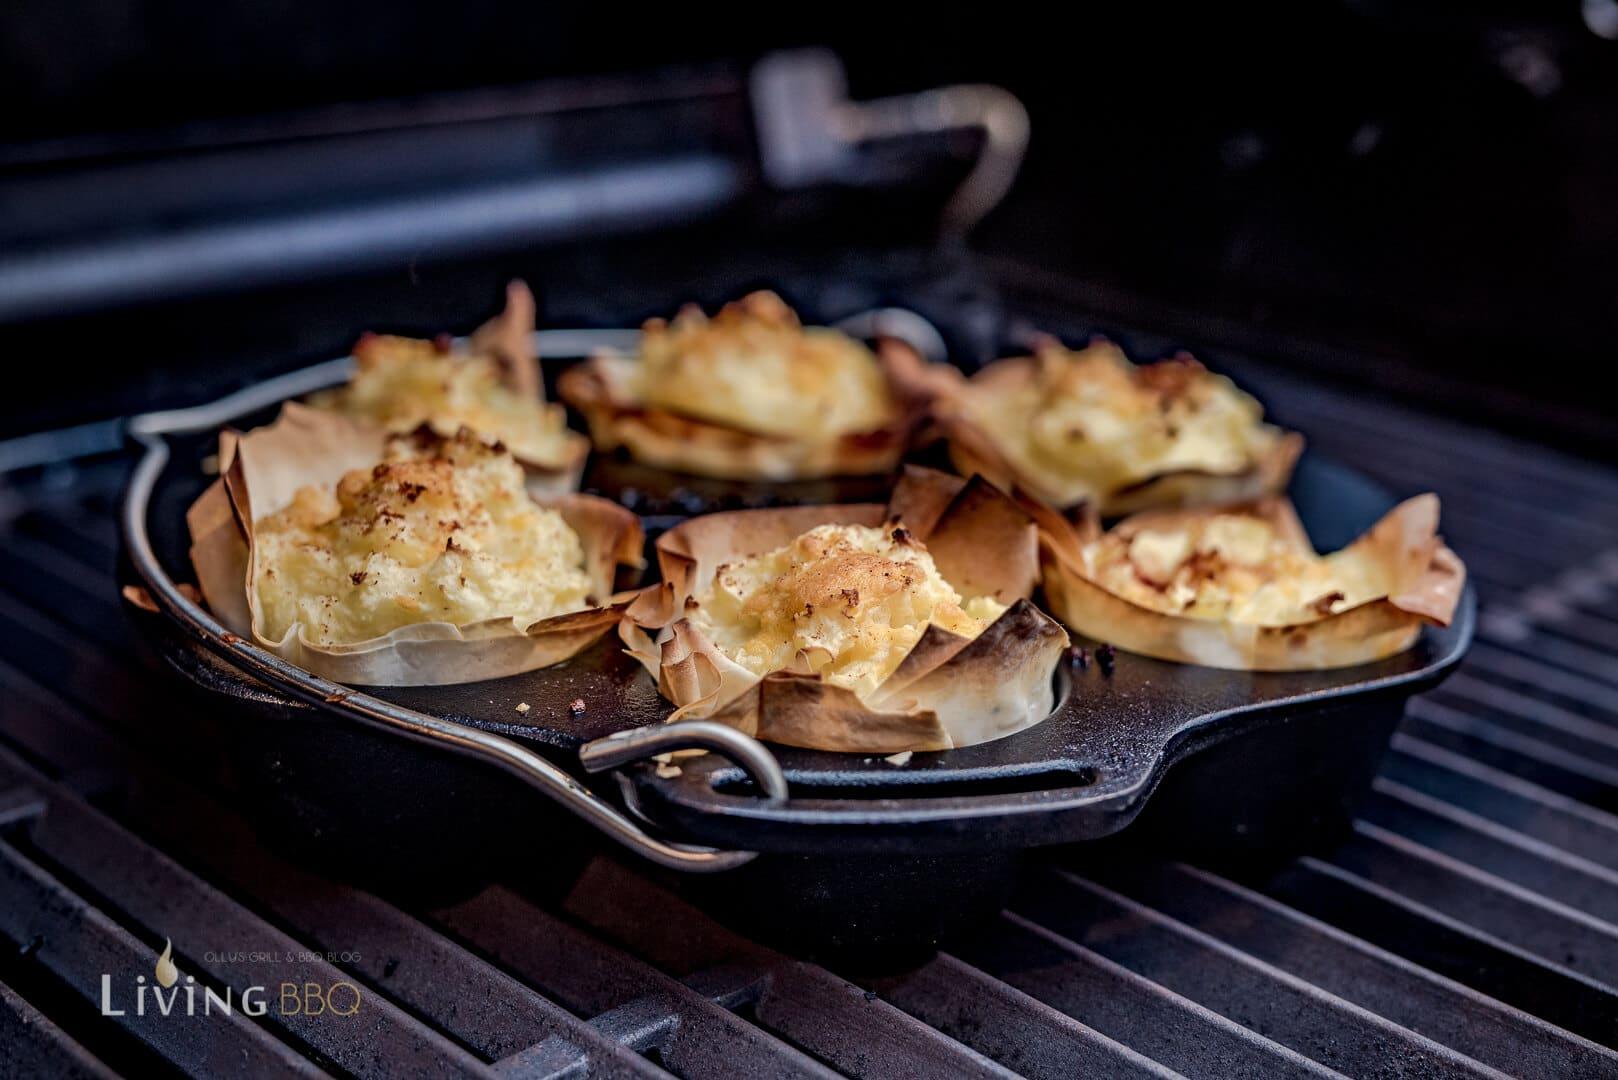 Muffinform aus Guss im Gasgrill [object object]_Sheperd  s Pie 17 von 21